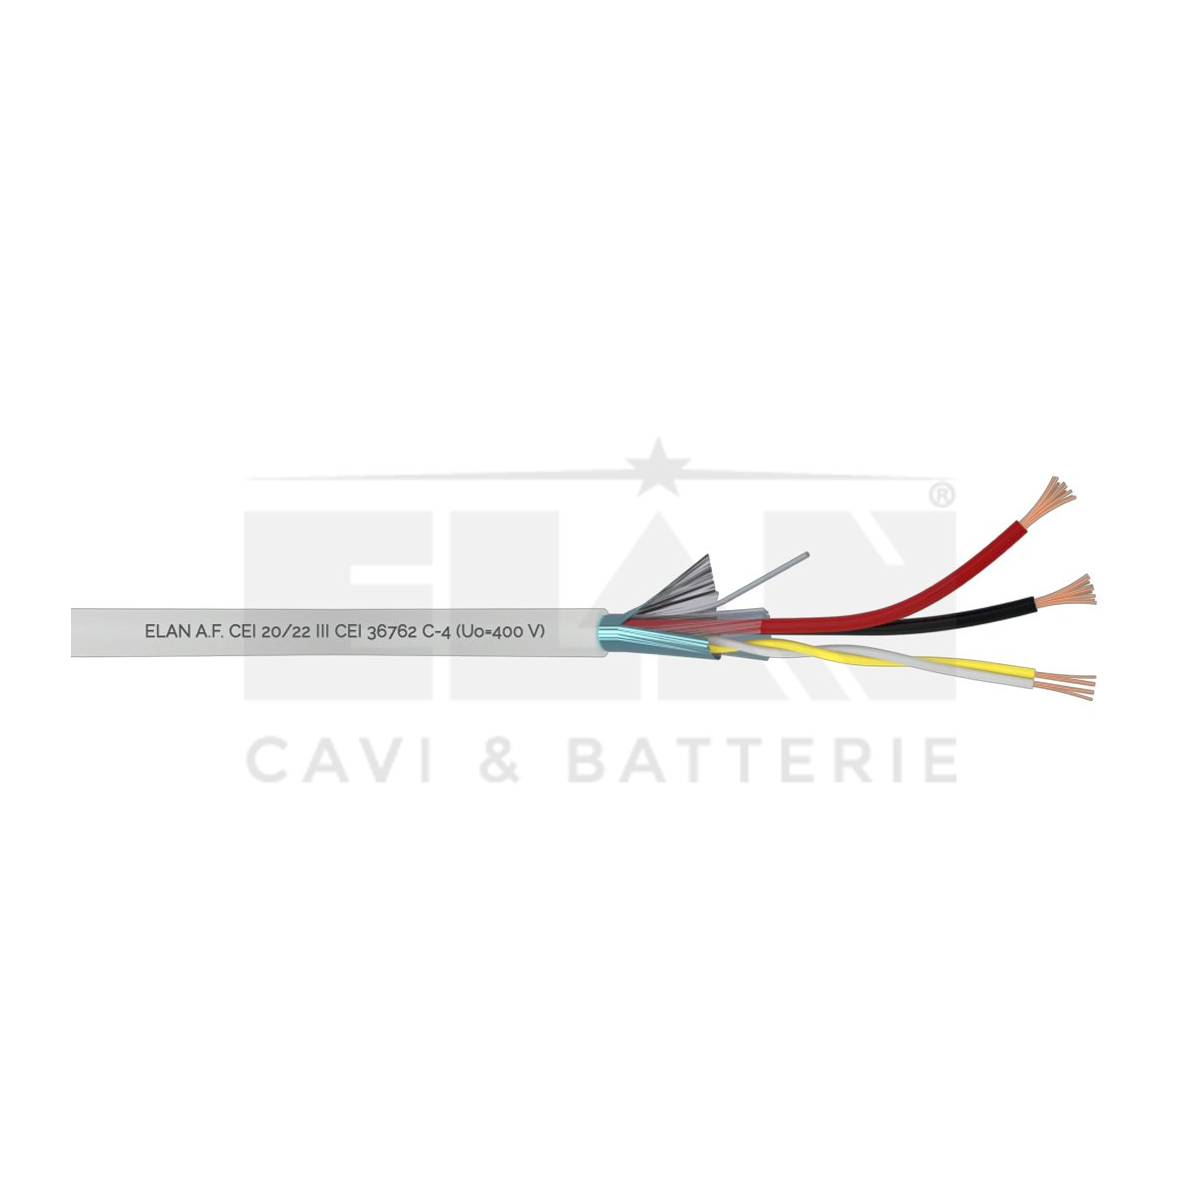 035221 Cabo PORTEIRO PVC 2 x 0,5 DIR + 2 x 0,22 Tw ELAN